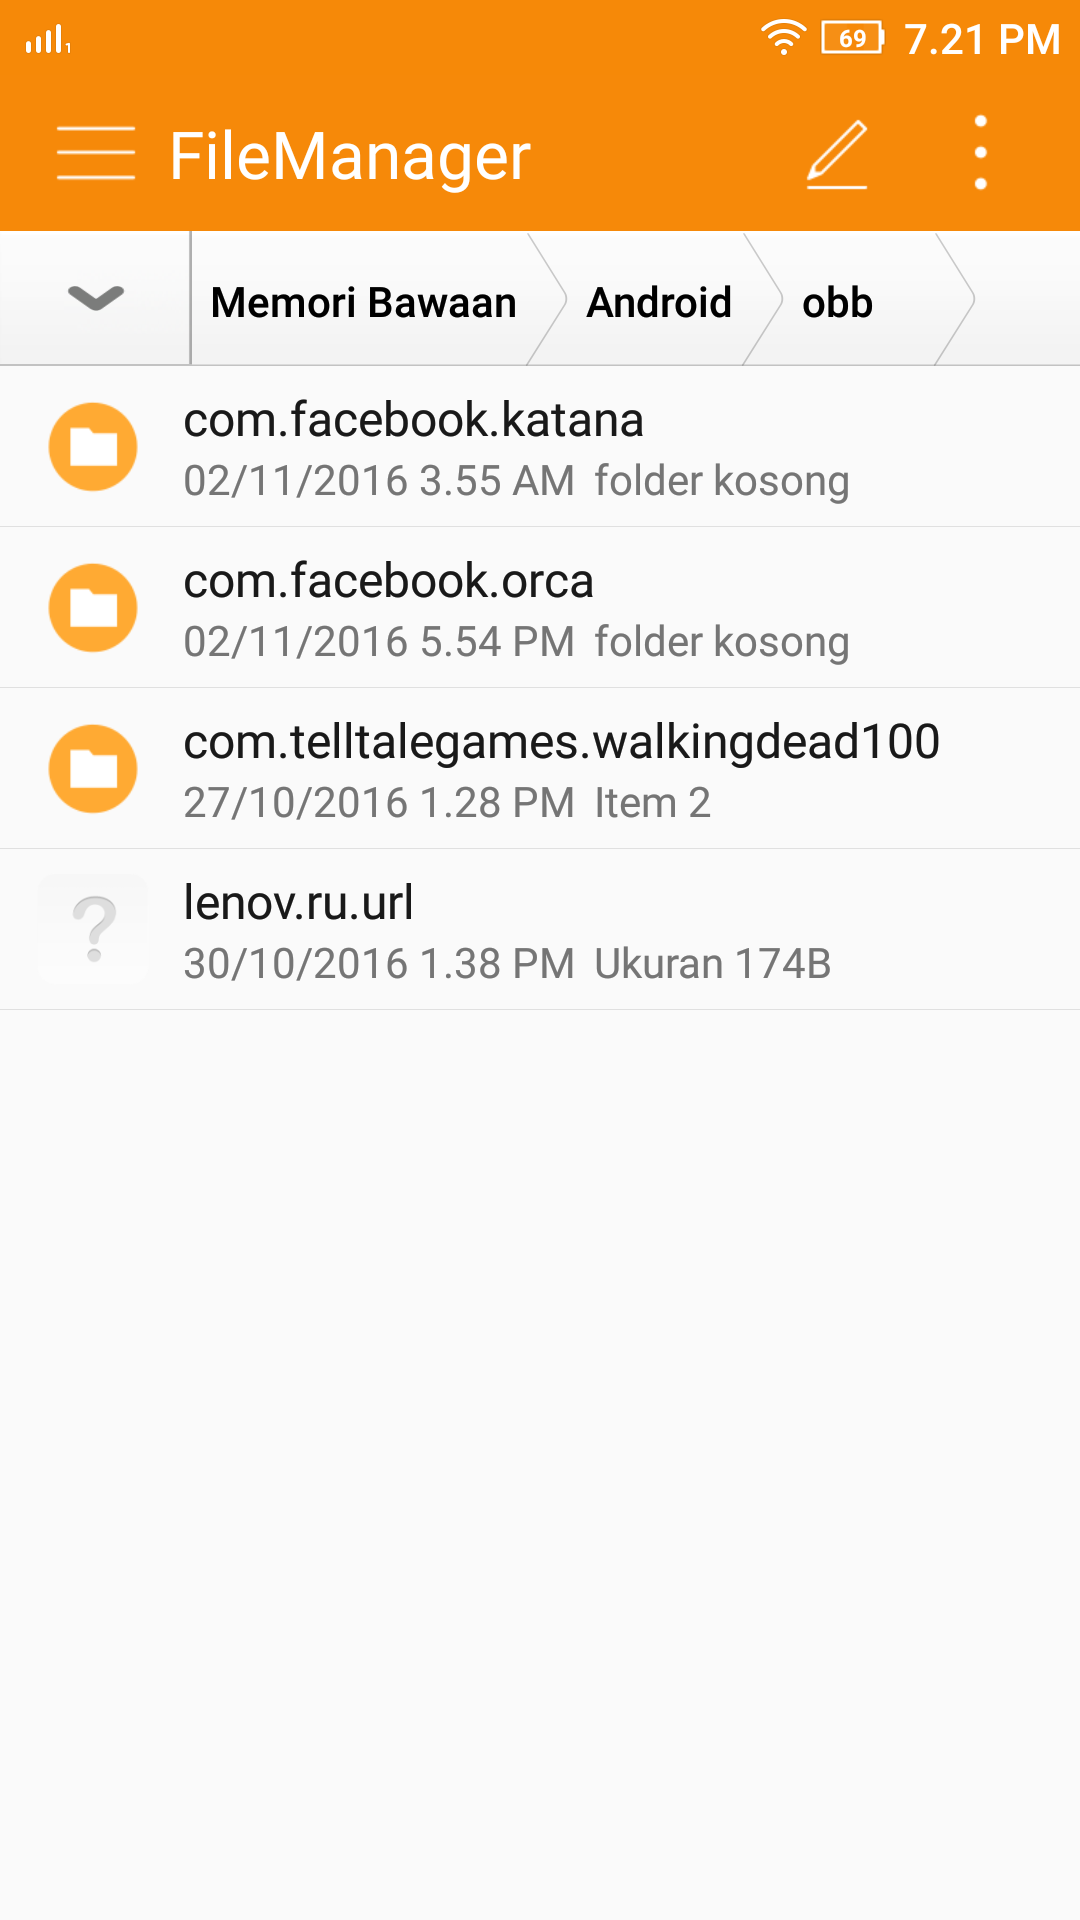 Screenshot 2016 11 03 19 21 04png